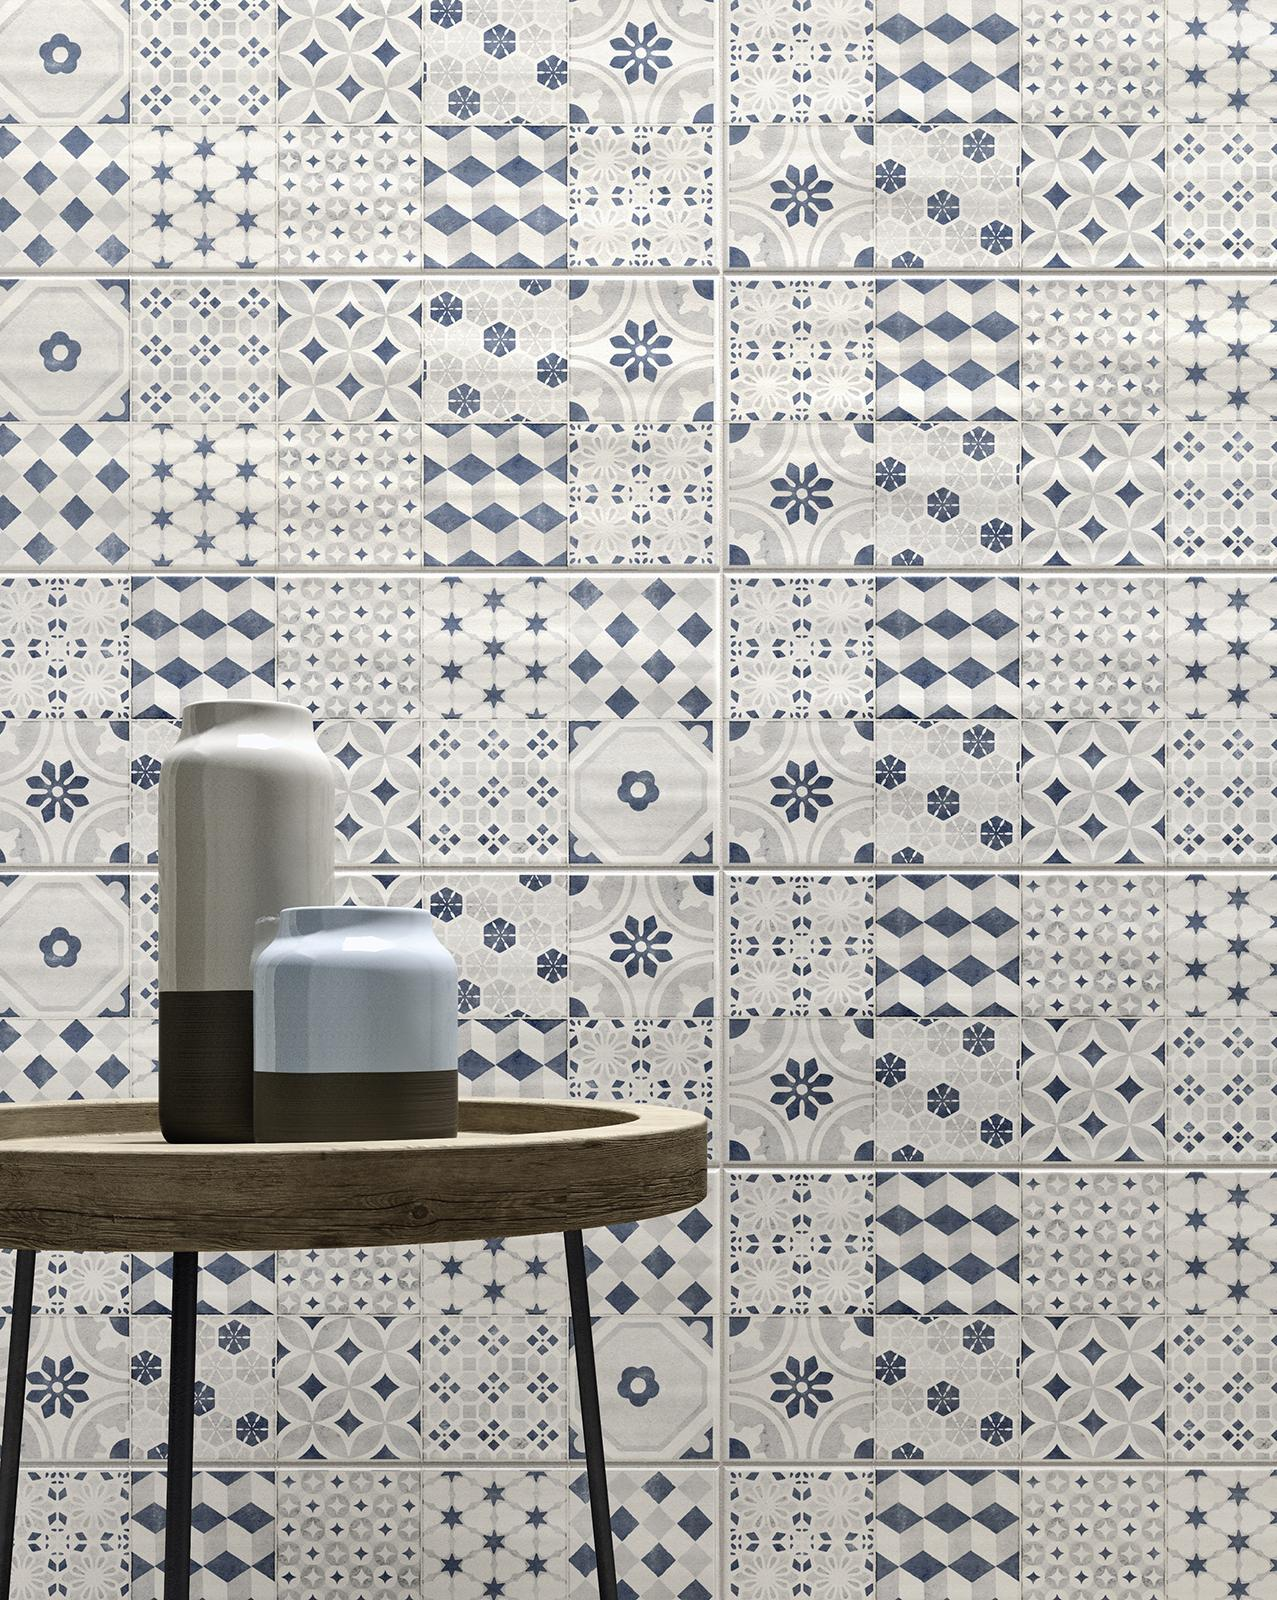 Paint - Kitchen and bathroom wall tiling | Marazzi